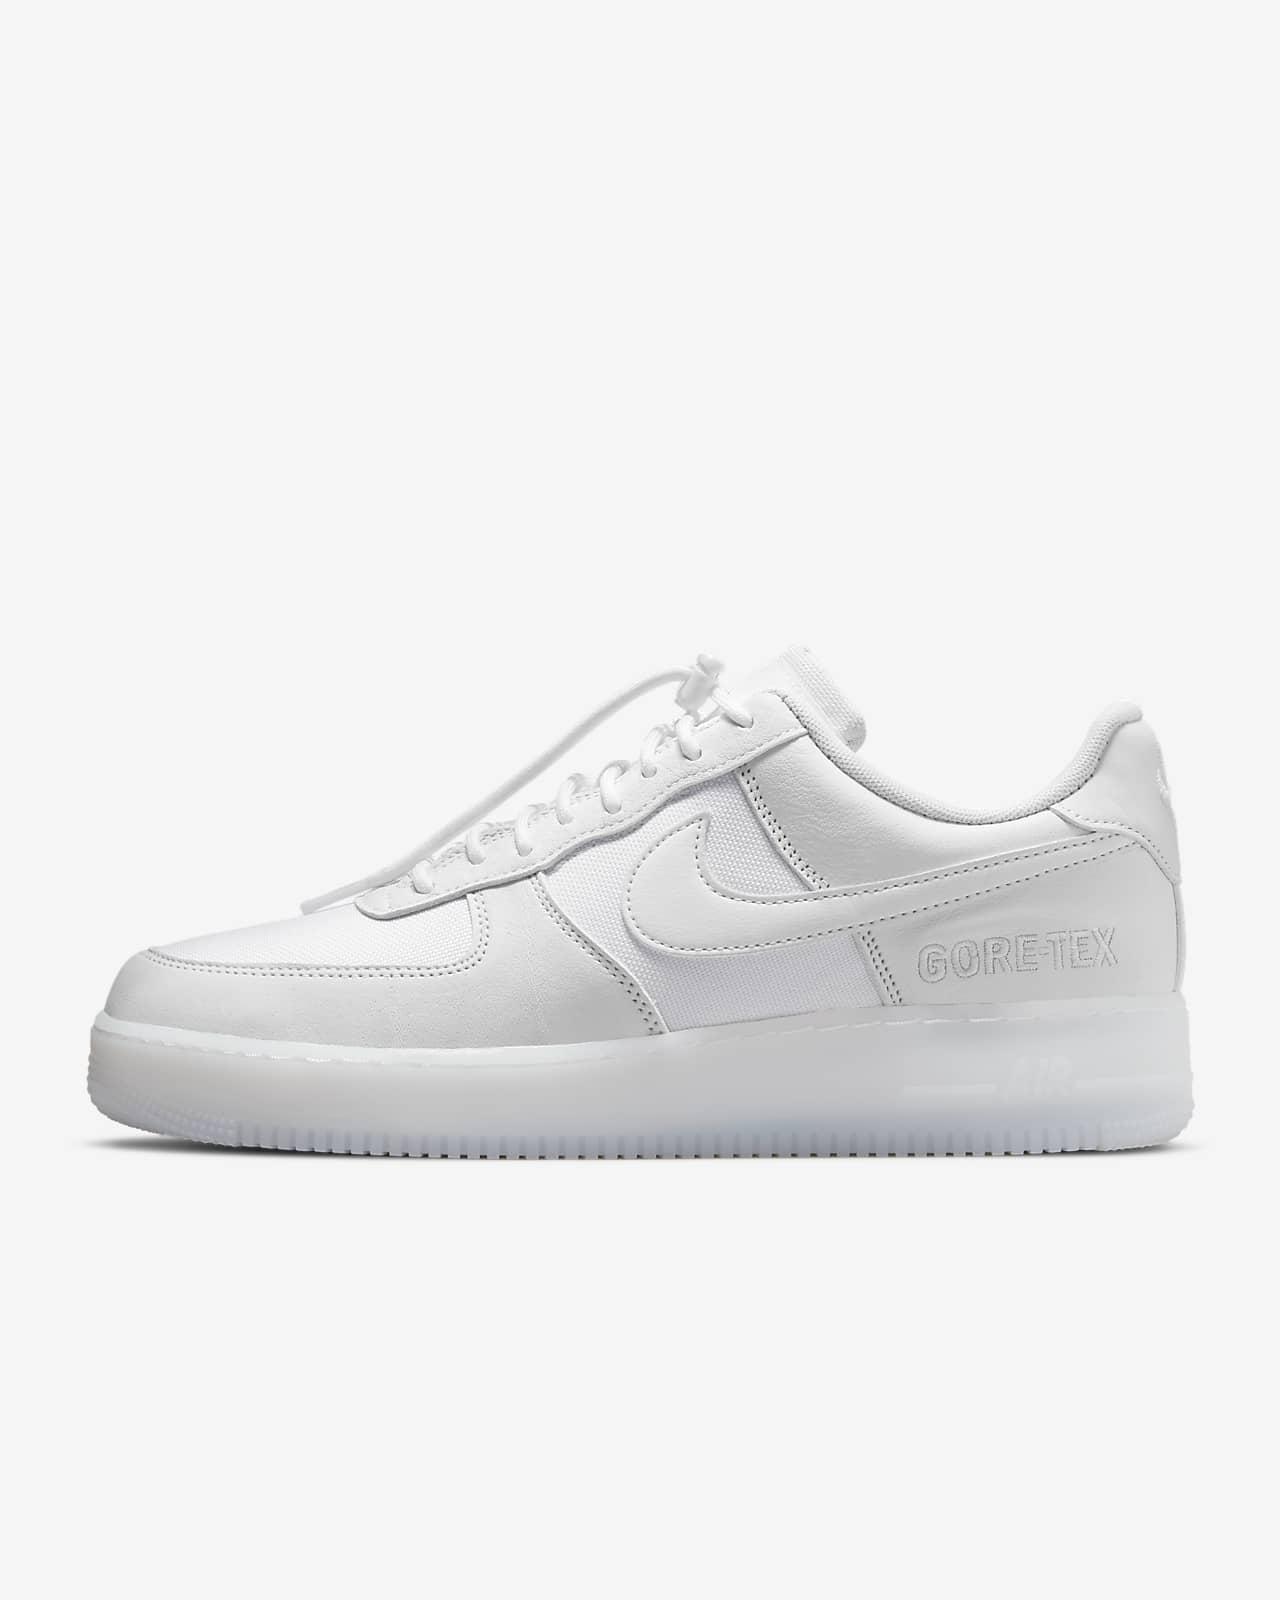 Nike Air Force 1 GTX Men's Shoes